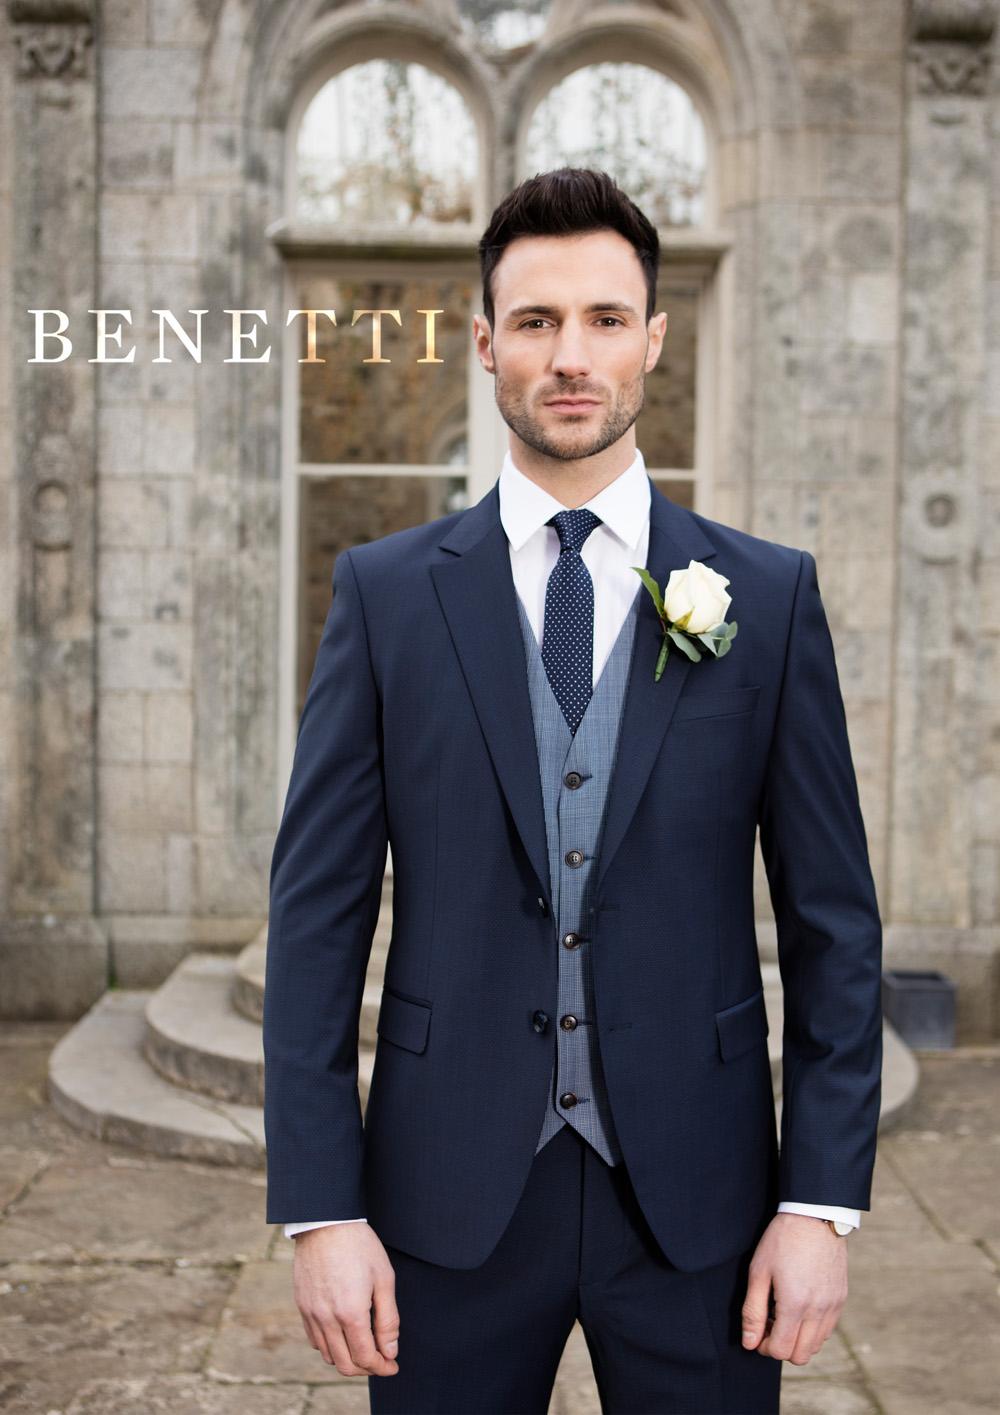 Benetti Micro Pattern 3 Piece Navy Suit Tom Murphy S